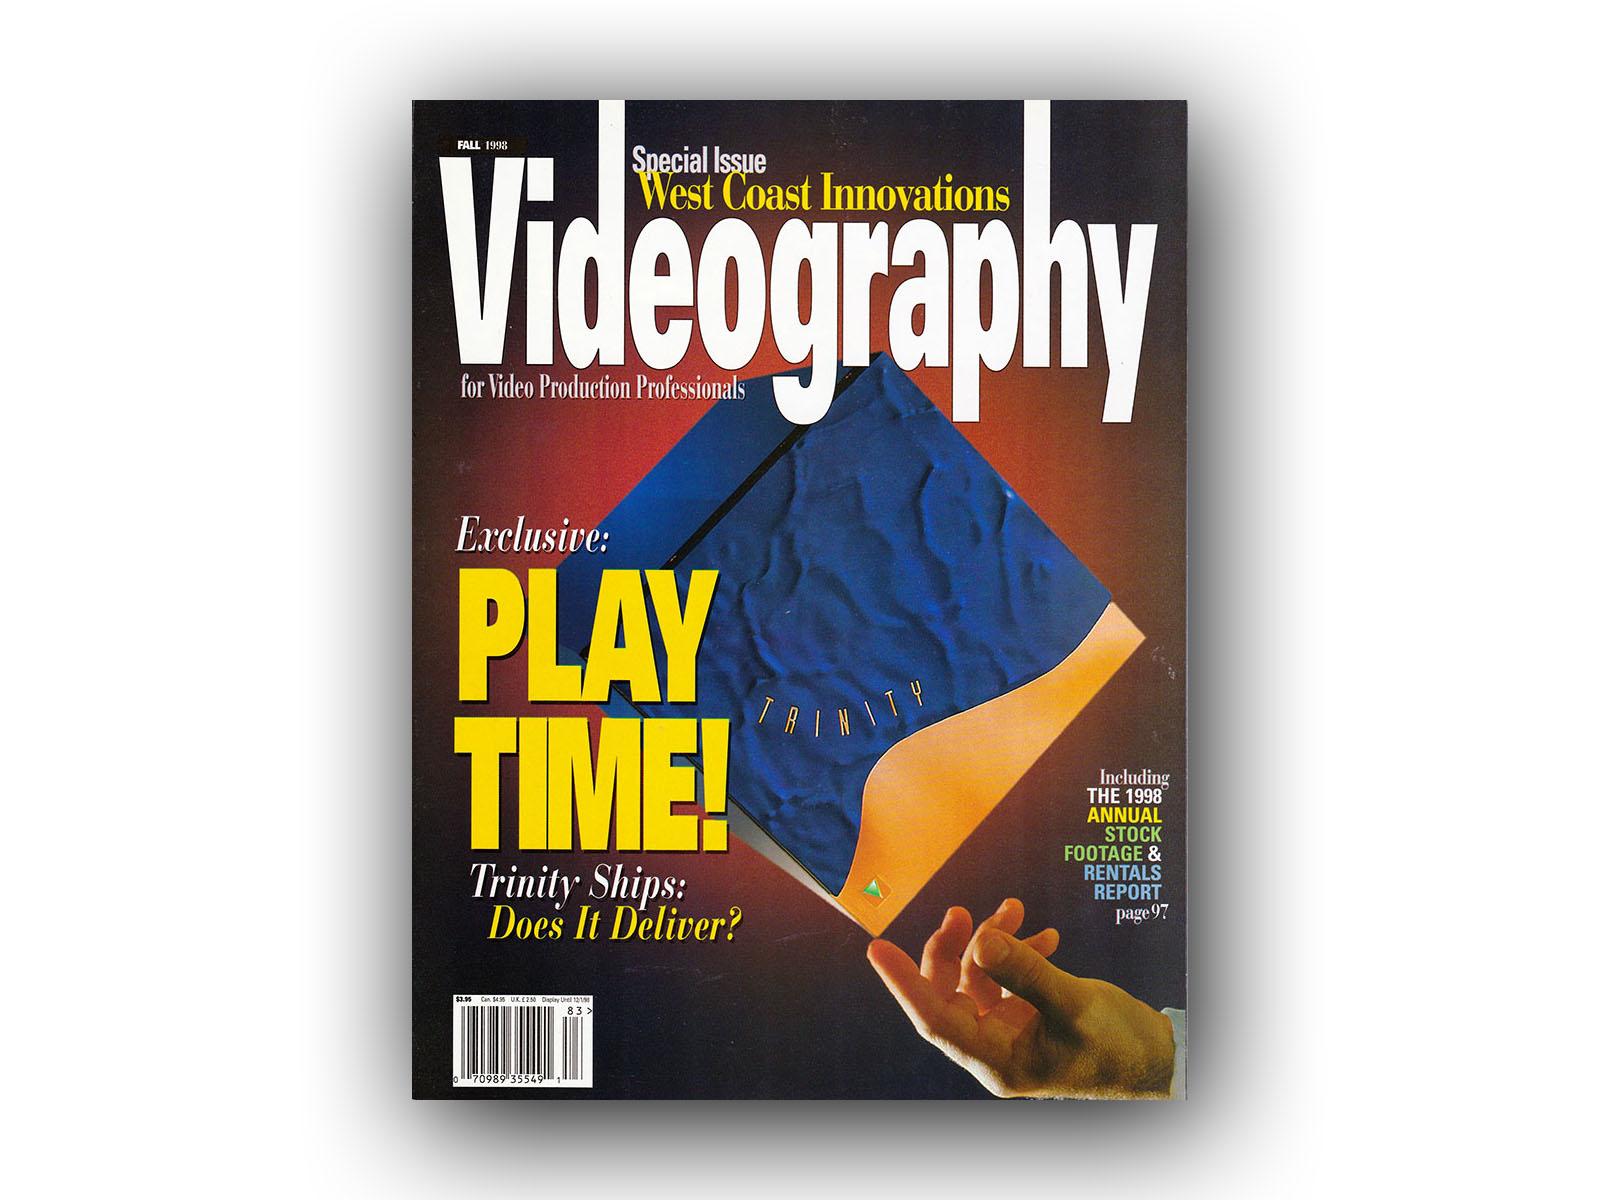 _0013_MagazineVideography-Fall98-Cover_web.jpg